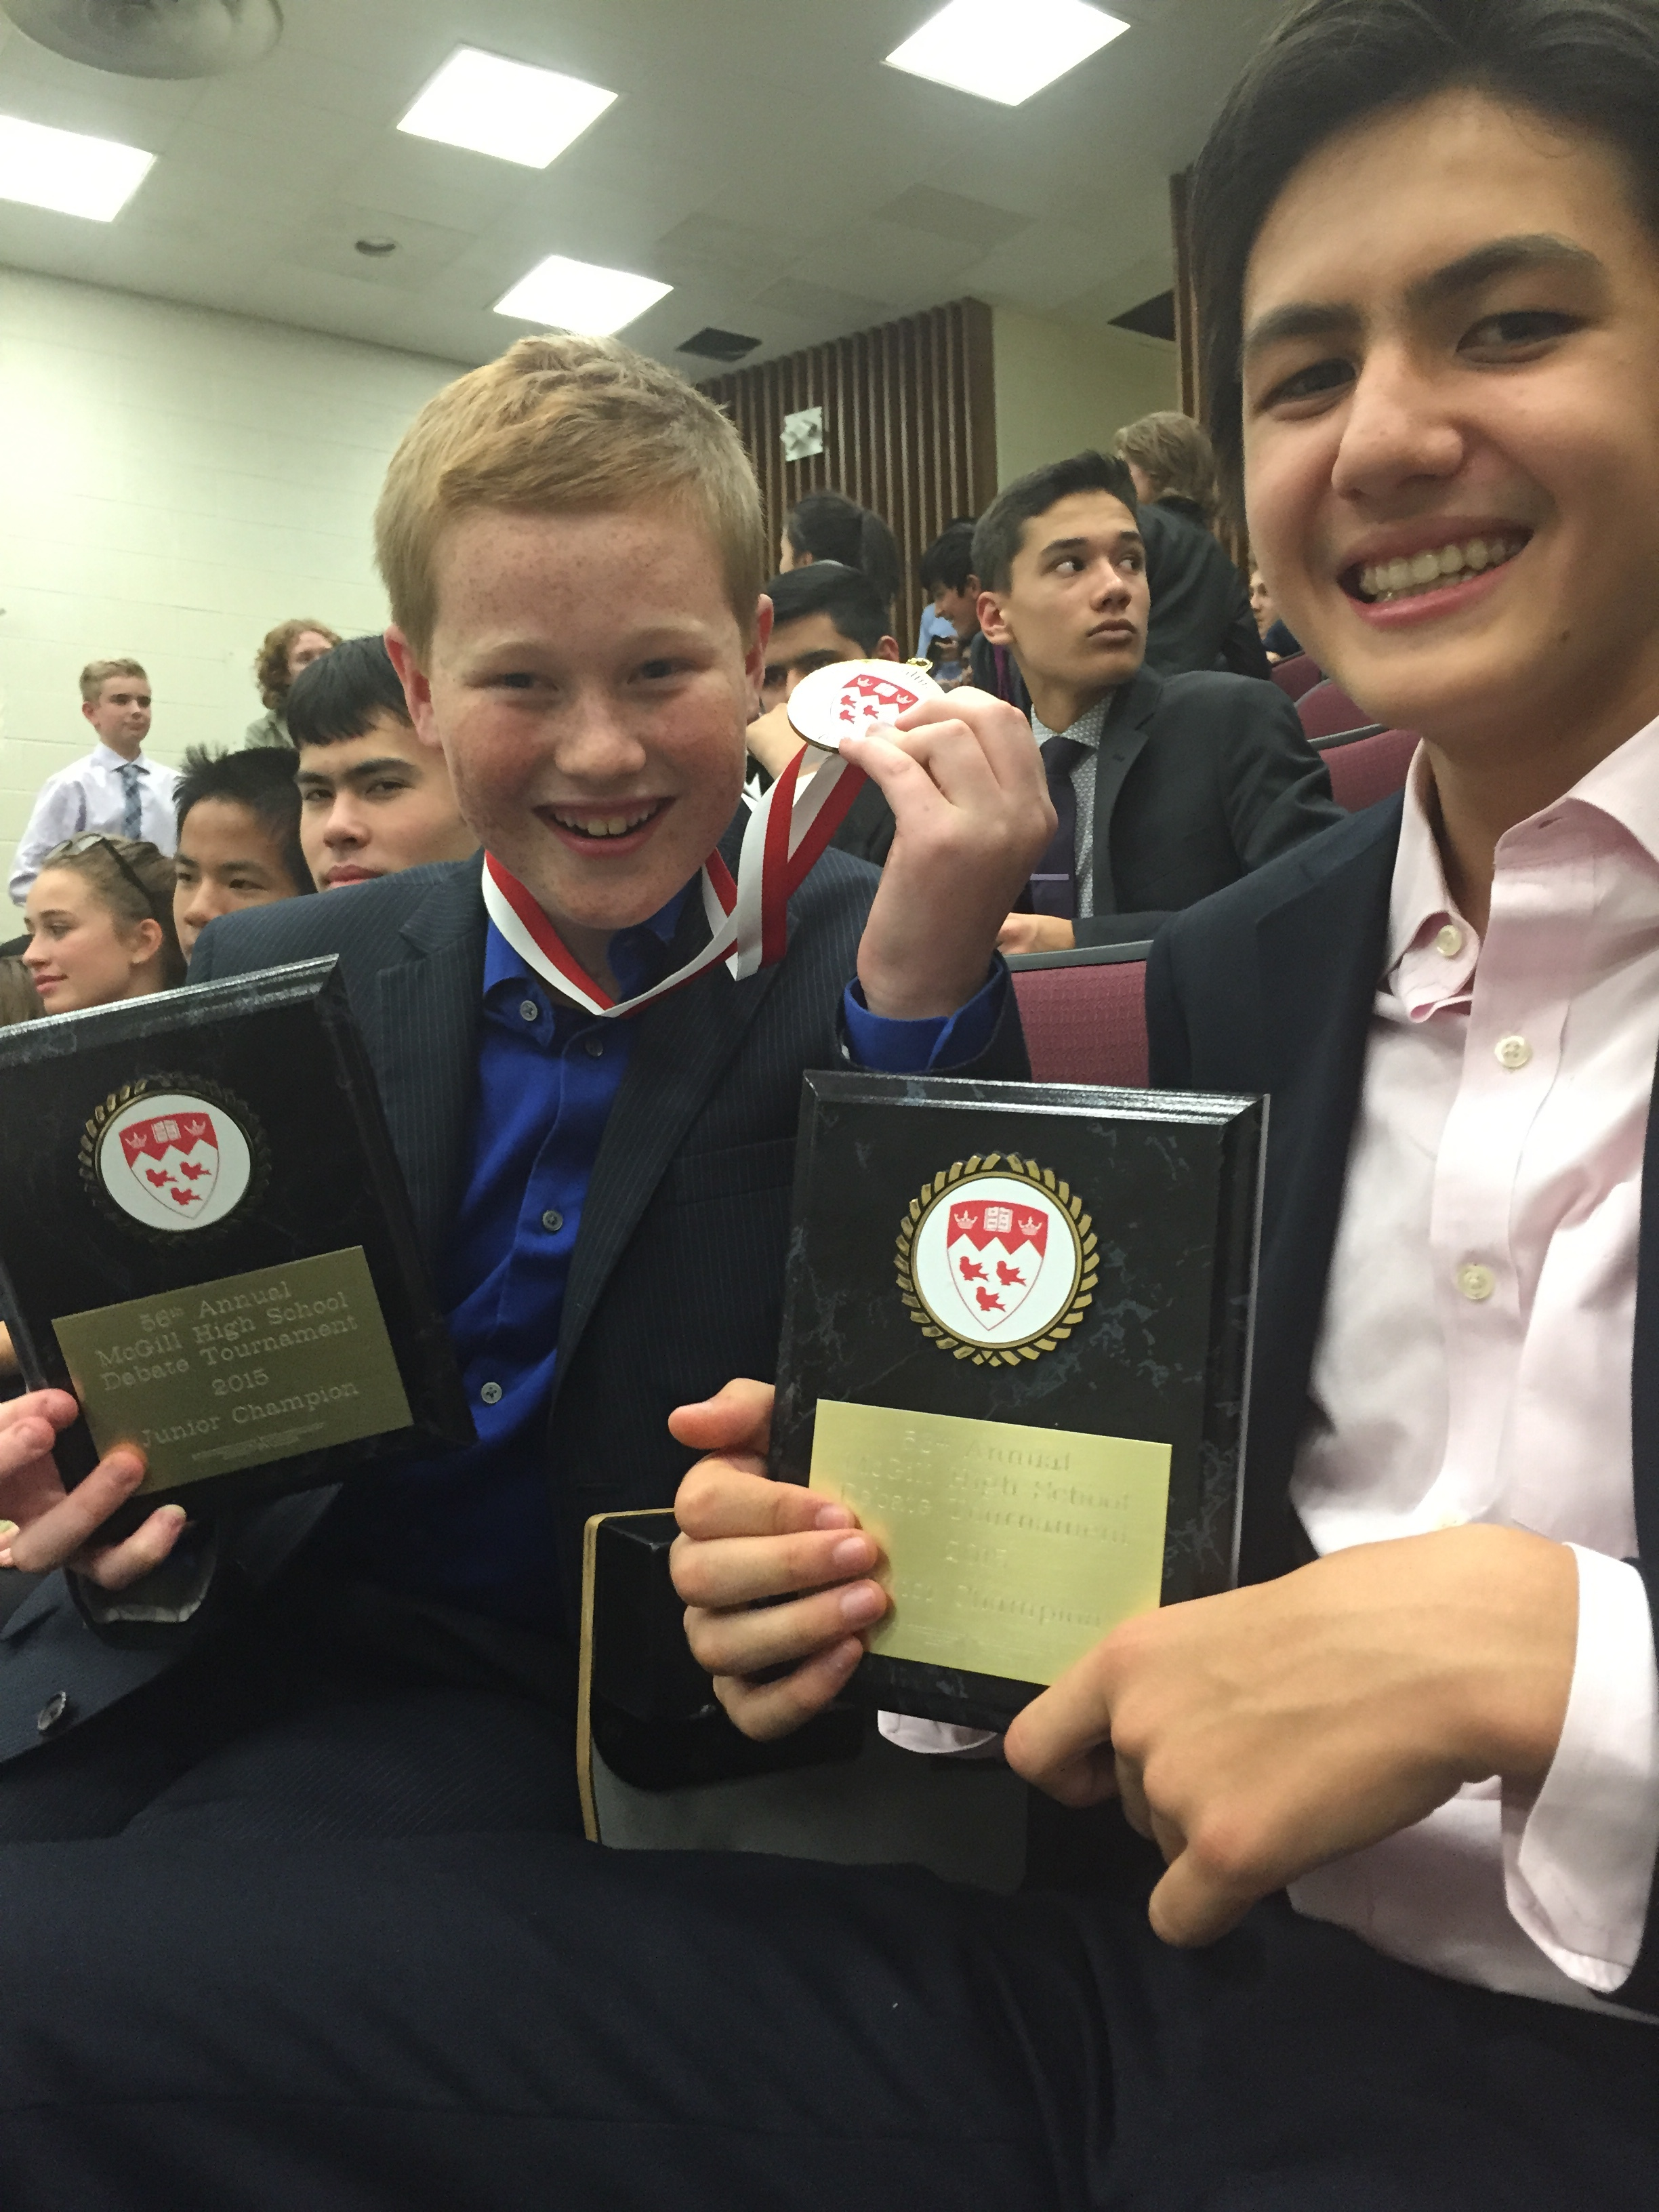 Patrick got top Junior Speaker of the Tournament;Ben Small took 3rd Novice Speaker.